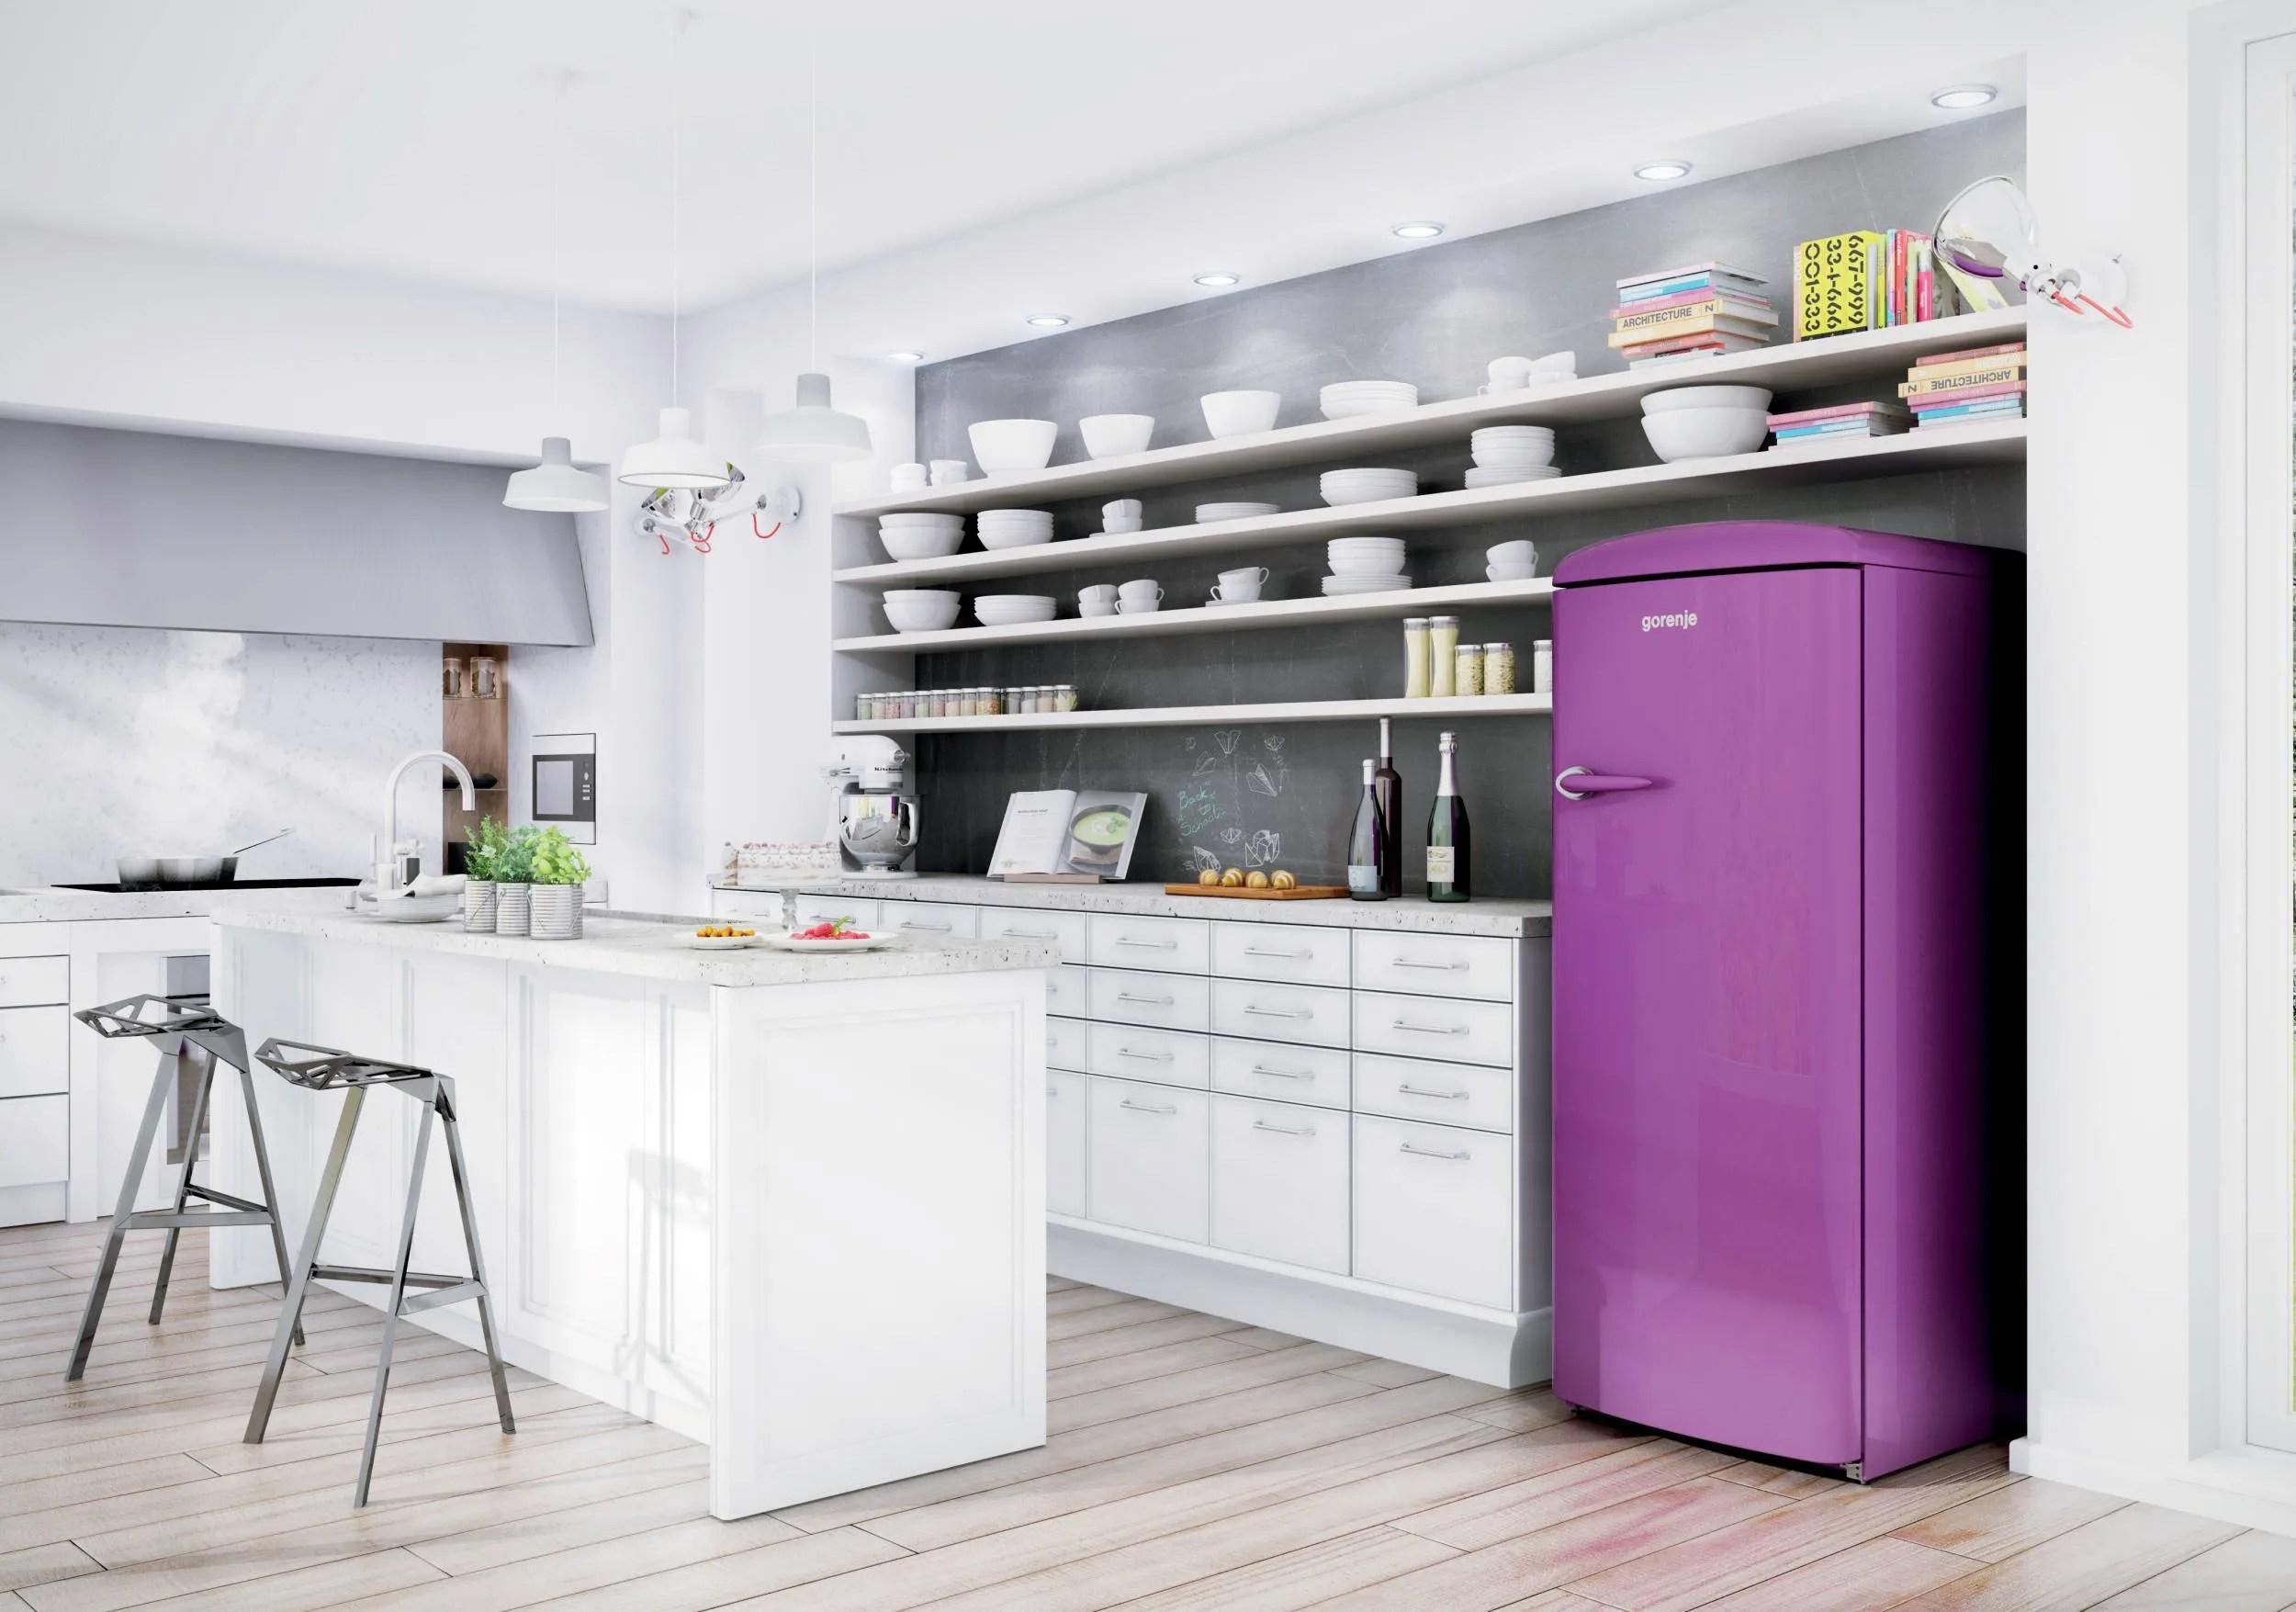 Gorenje Kühlschrank Retro Vw : Autohaus braun jetzt bei uns der bulli kühlschrank autohaus braun